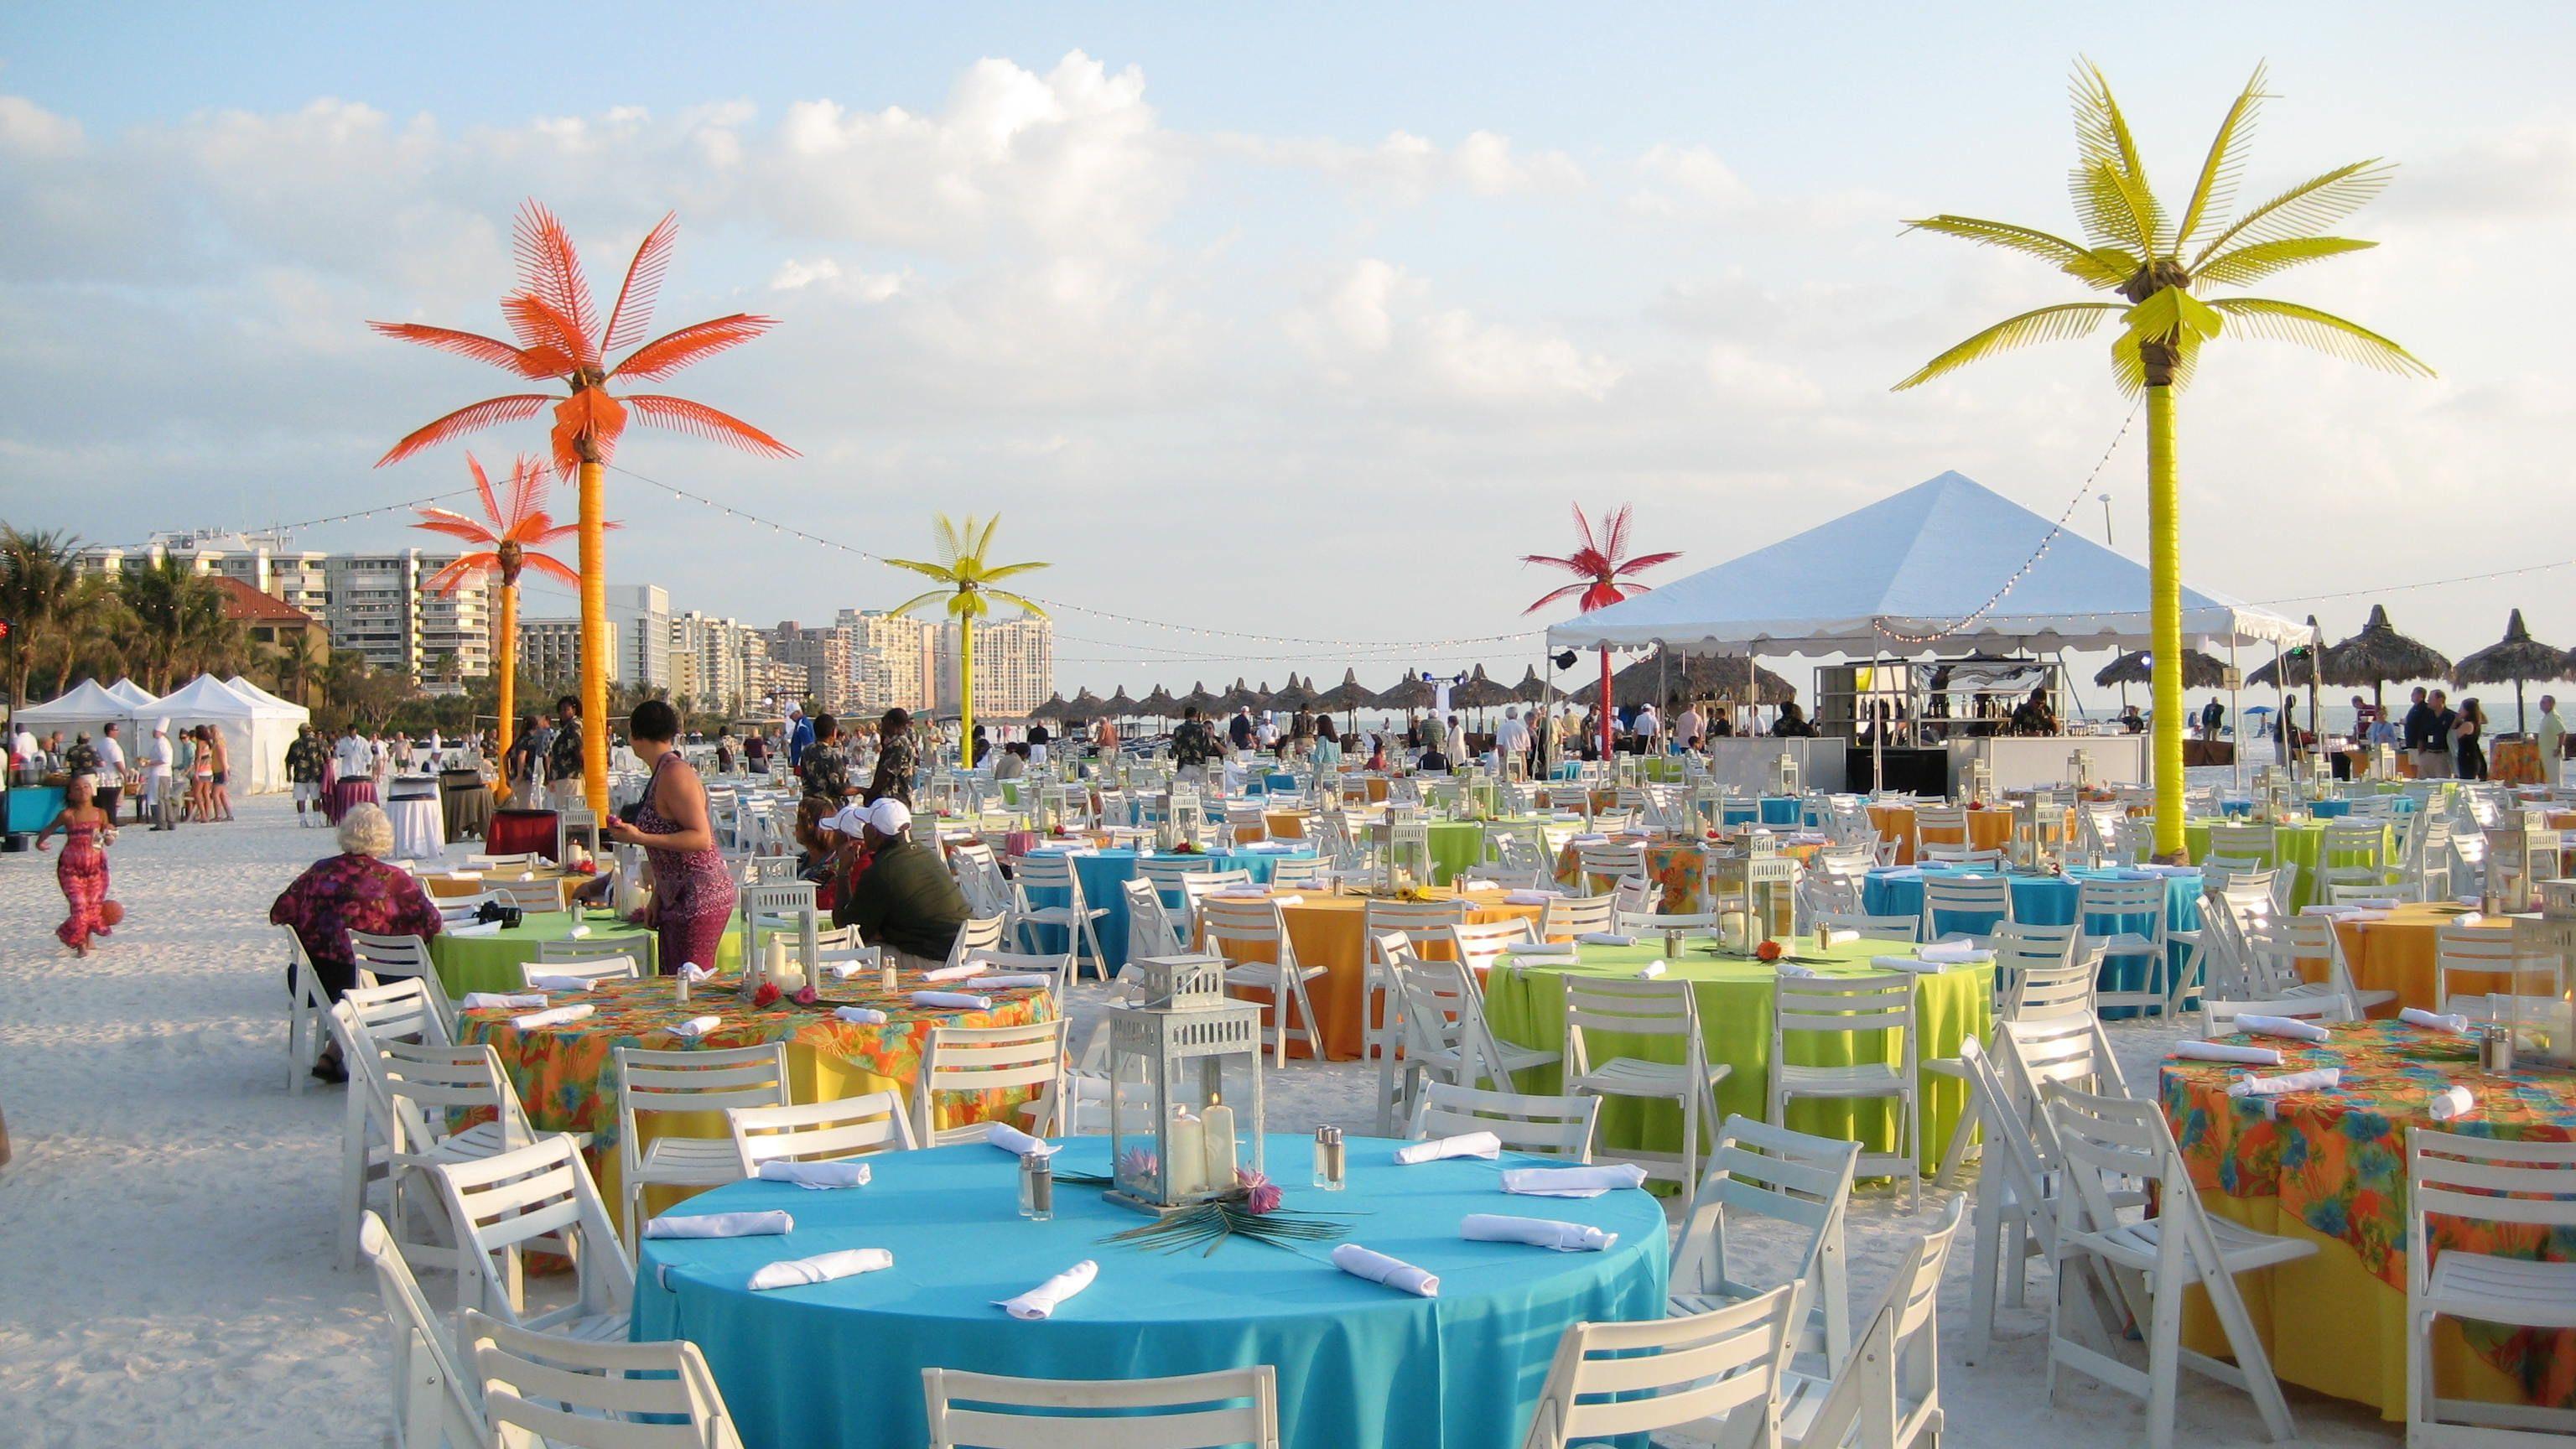 Caribbean Themed Backyard Party Ideas  Outdoor Caribbean Beach Themed Event by Wizard Connection